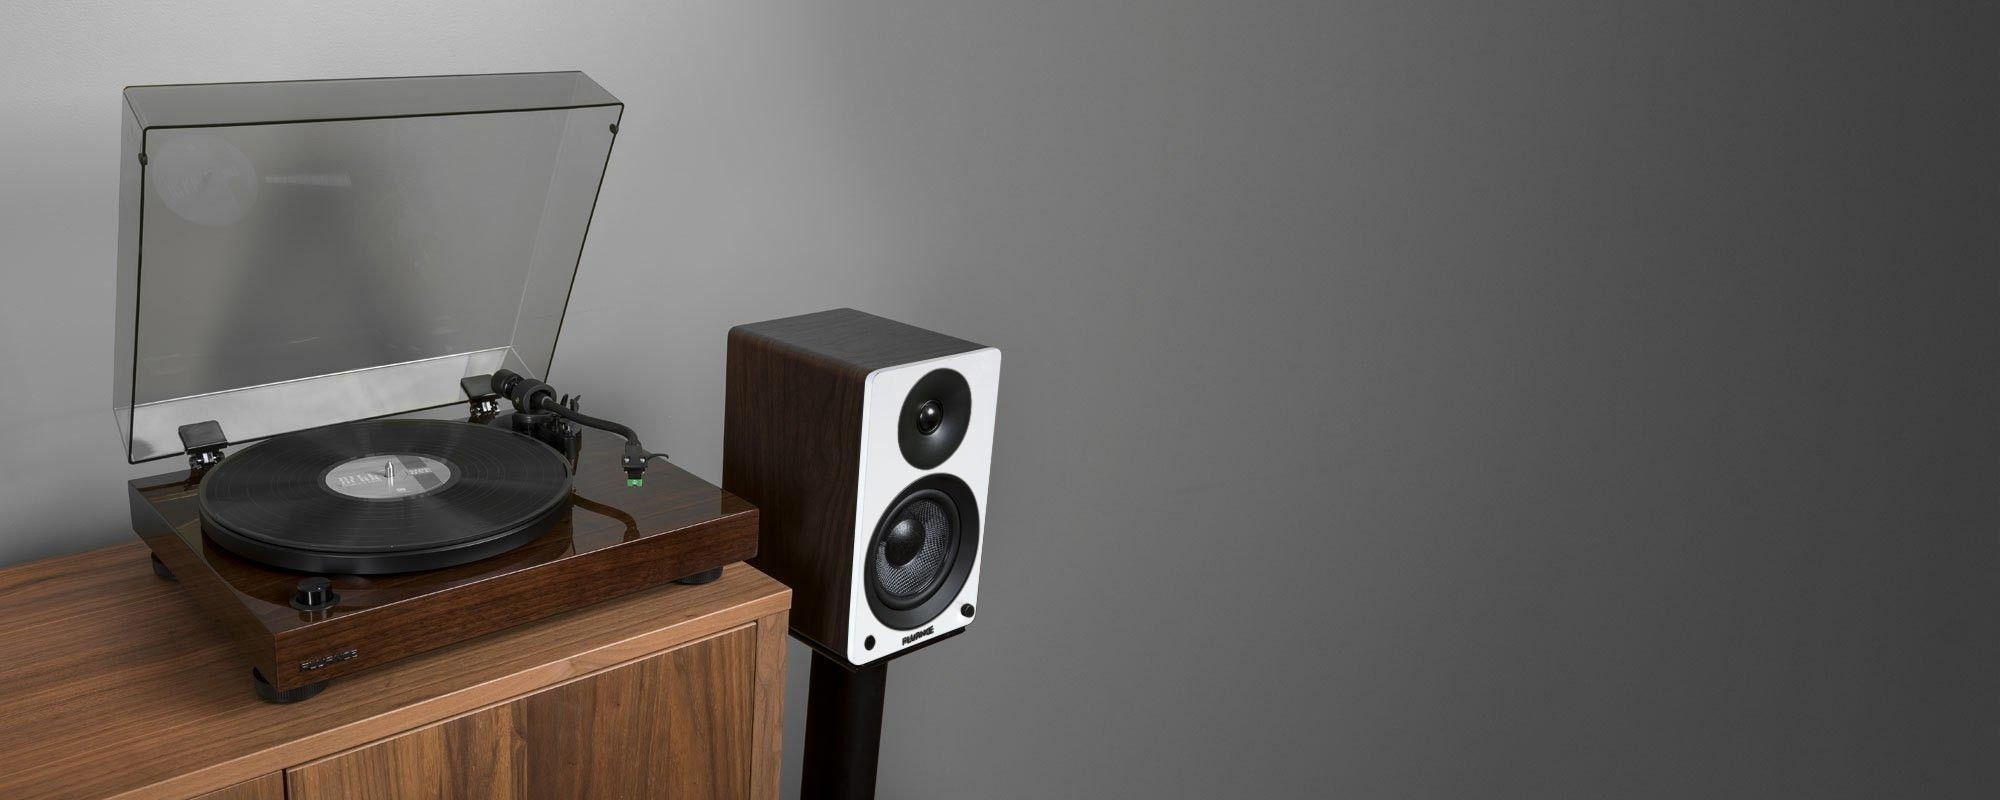 "RT81 Elite High Fidelity Vinyl Turntable with Ai41 Powered 5"" Stereo Bookshelf Speakers - Lifestyle"